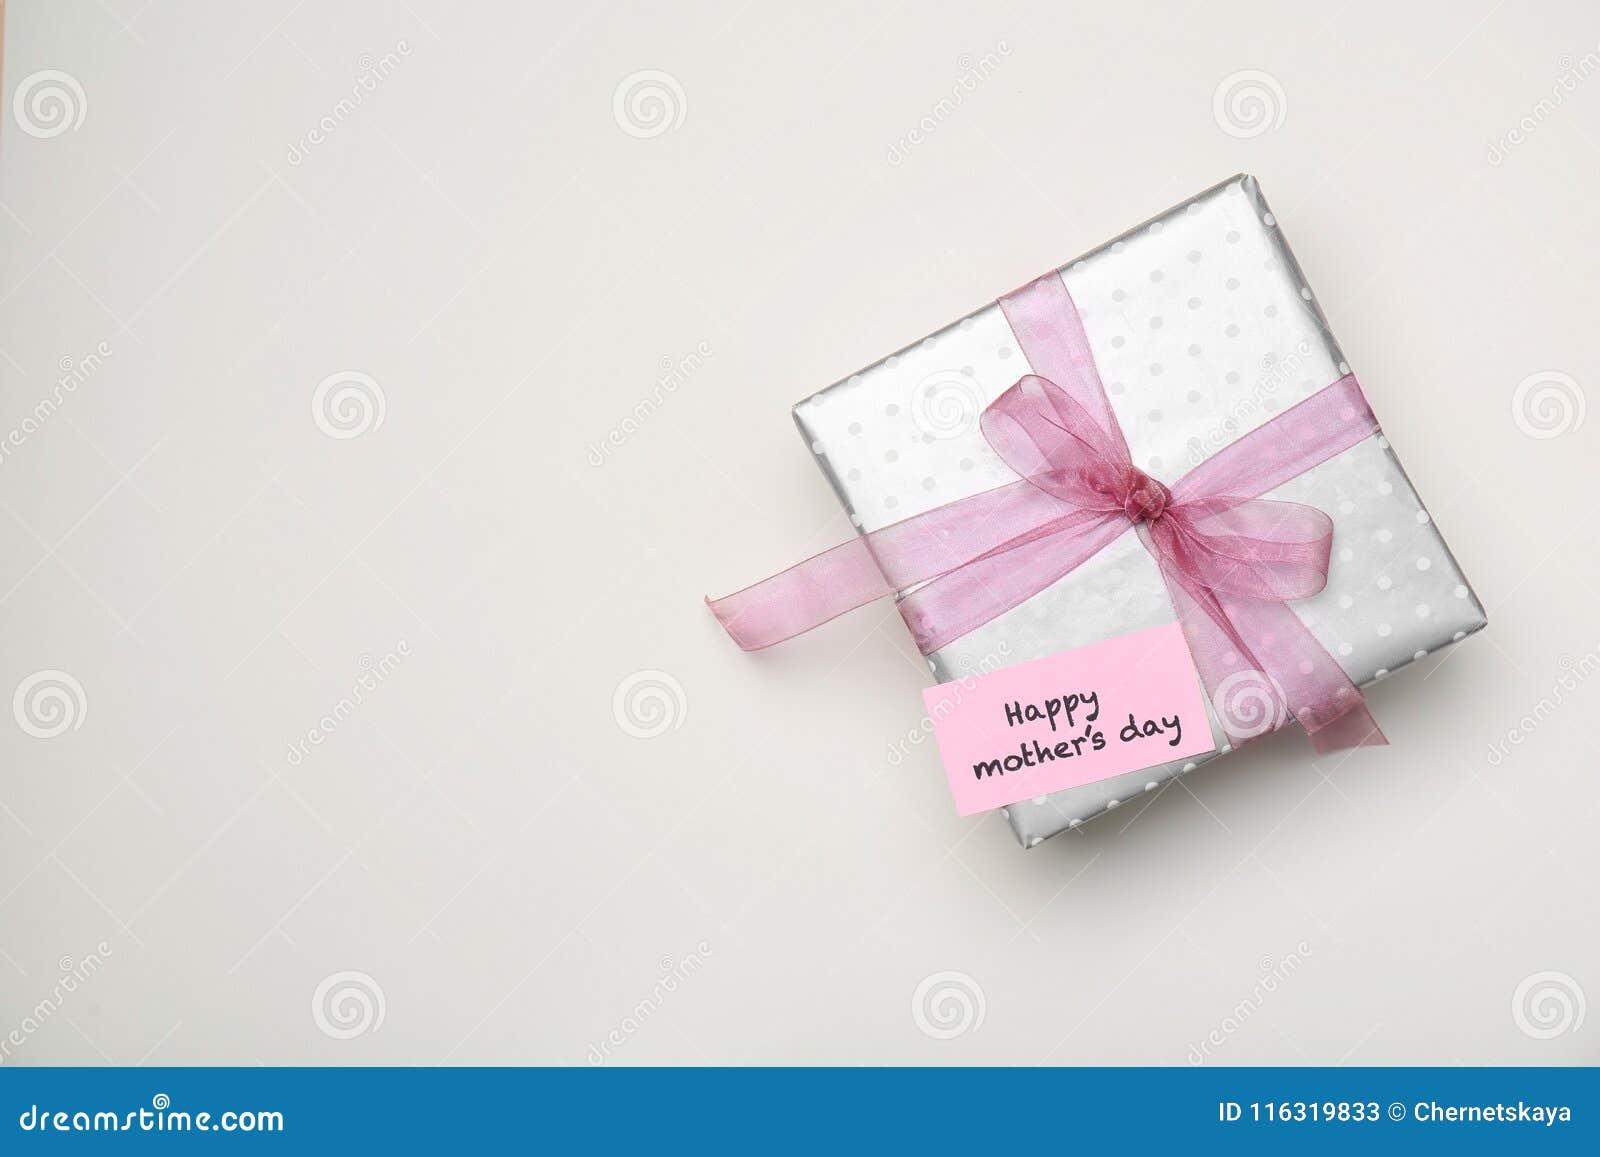 Elegant Gift Box For Mothers Day On Light Background